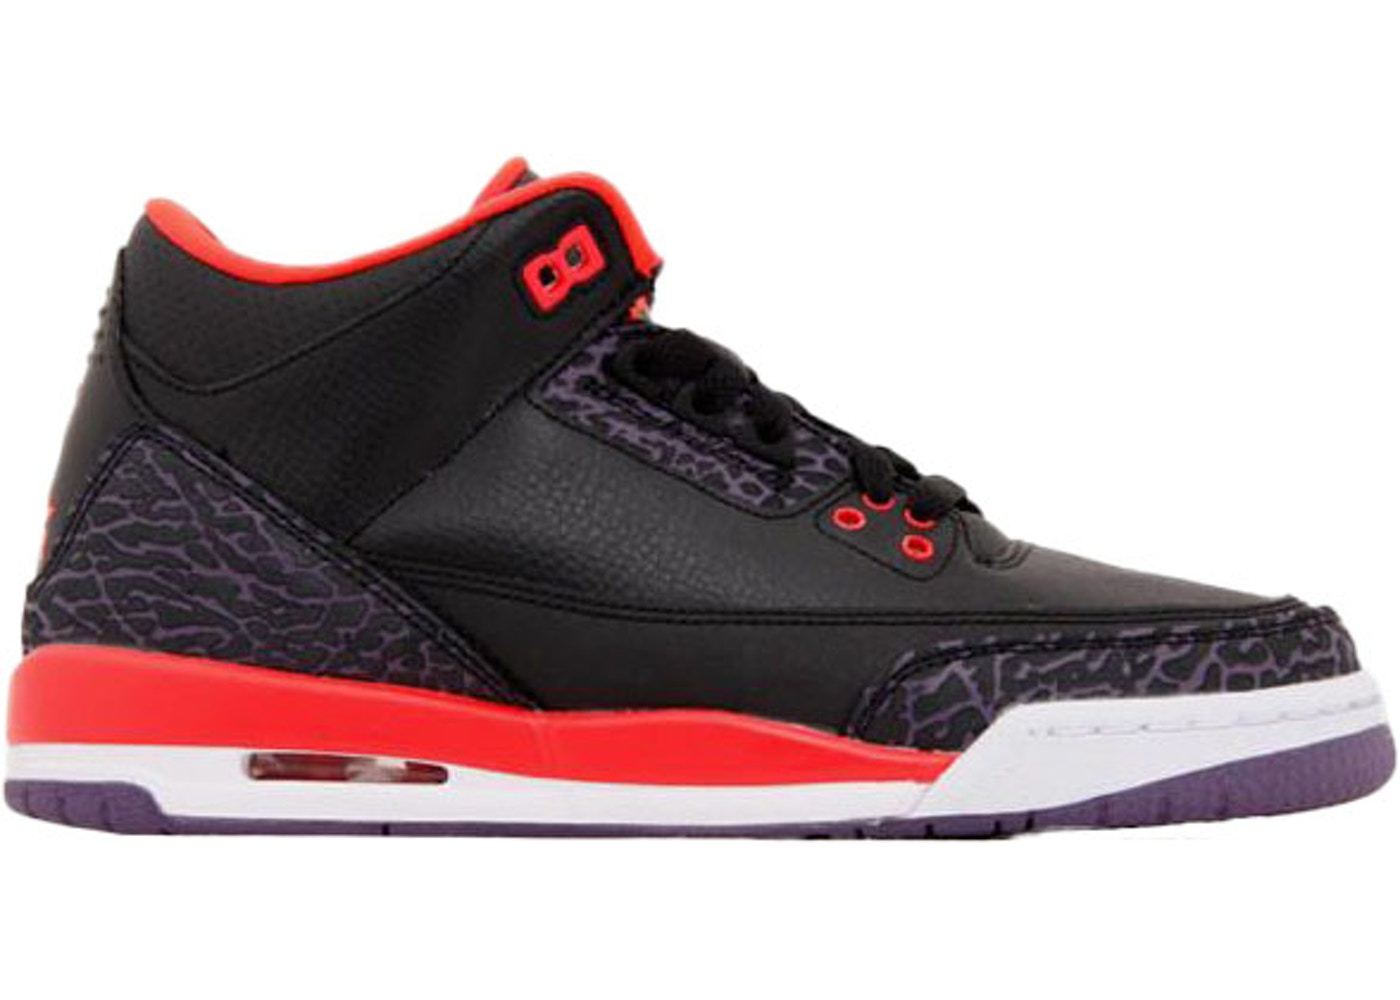 half off 05f38 8b41a Jordan 3 Retro Crimson (GS)